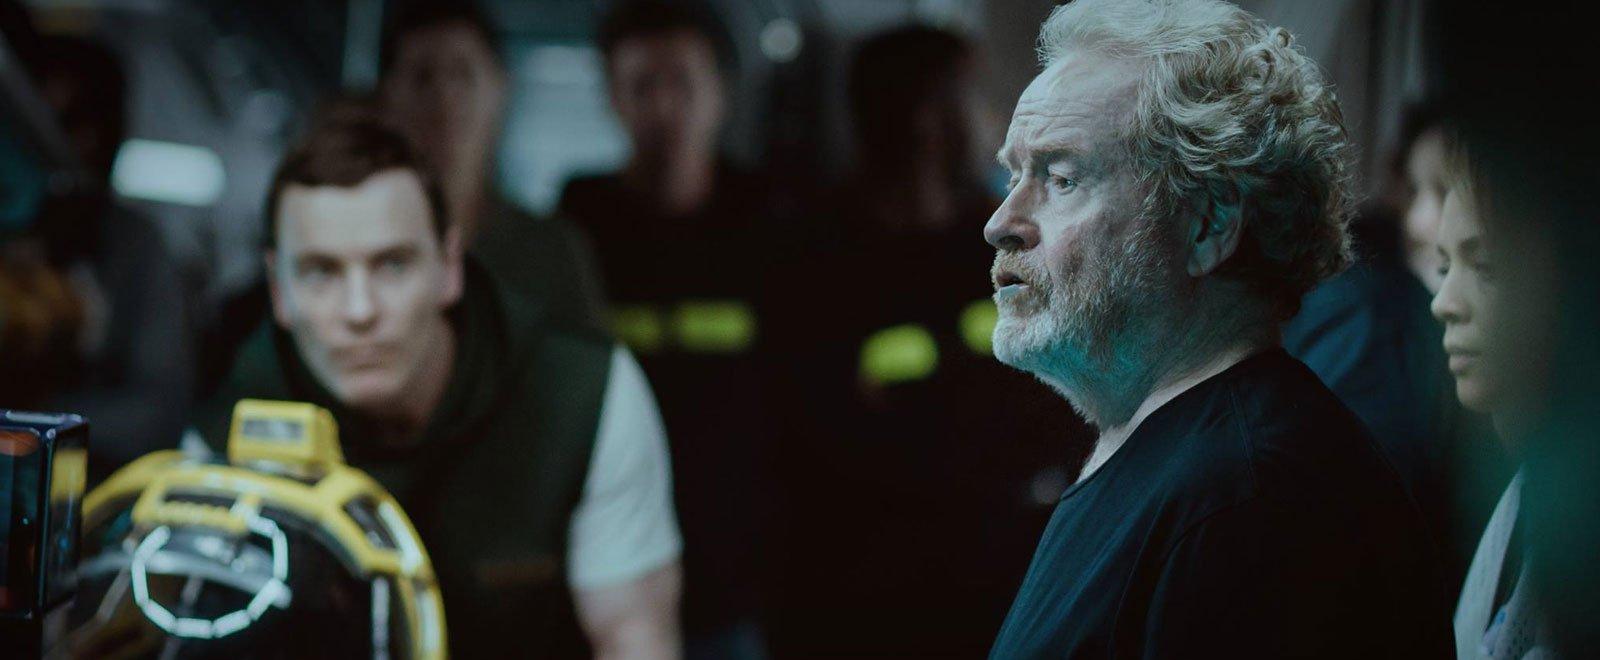 Рідлі Скотт | Чужий: Заповіт / Alien: Covenant (2017)